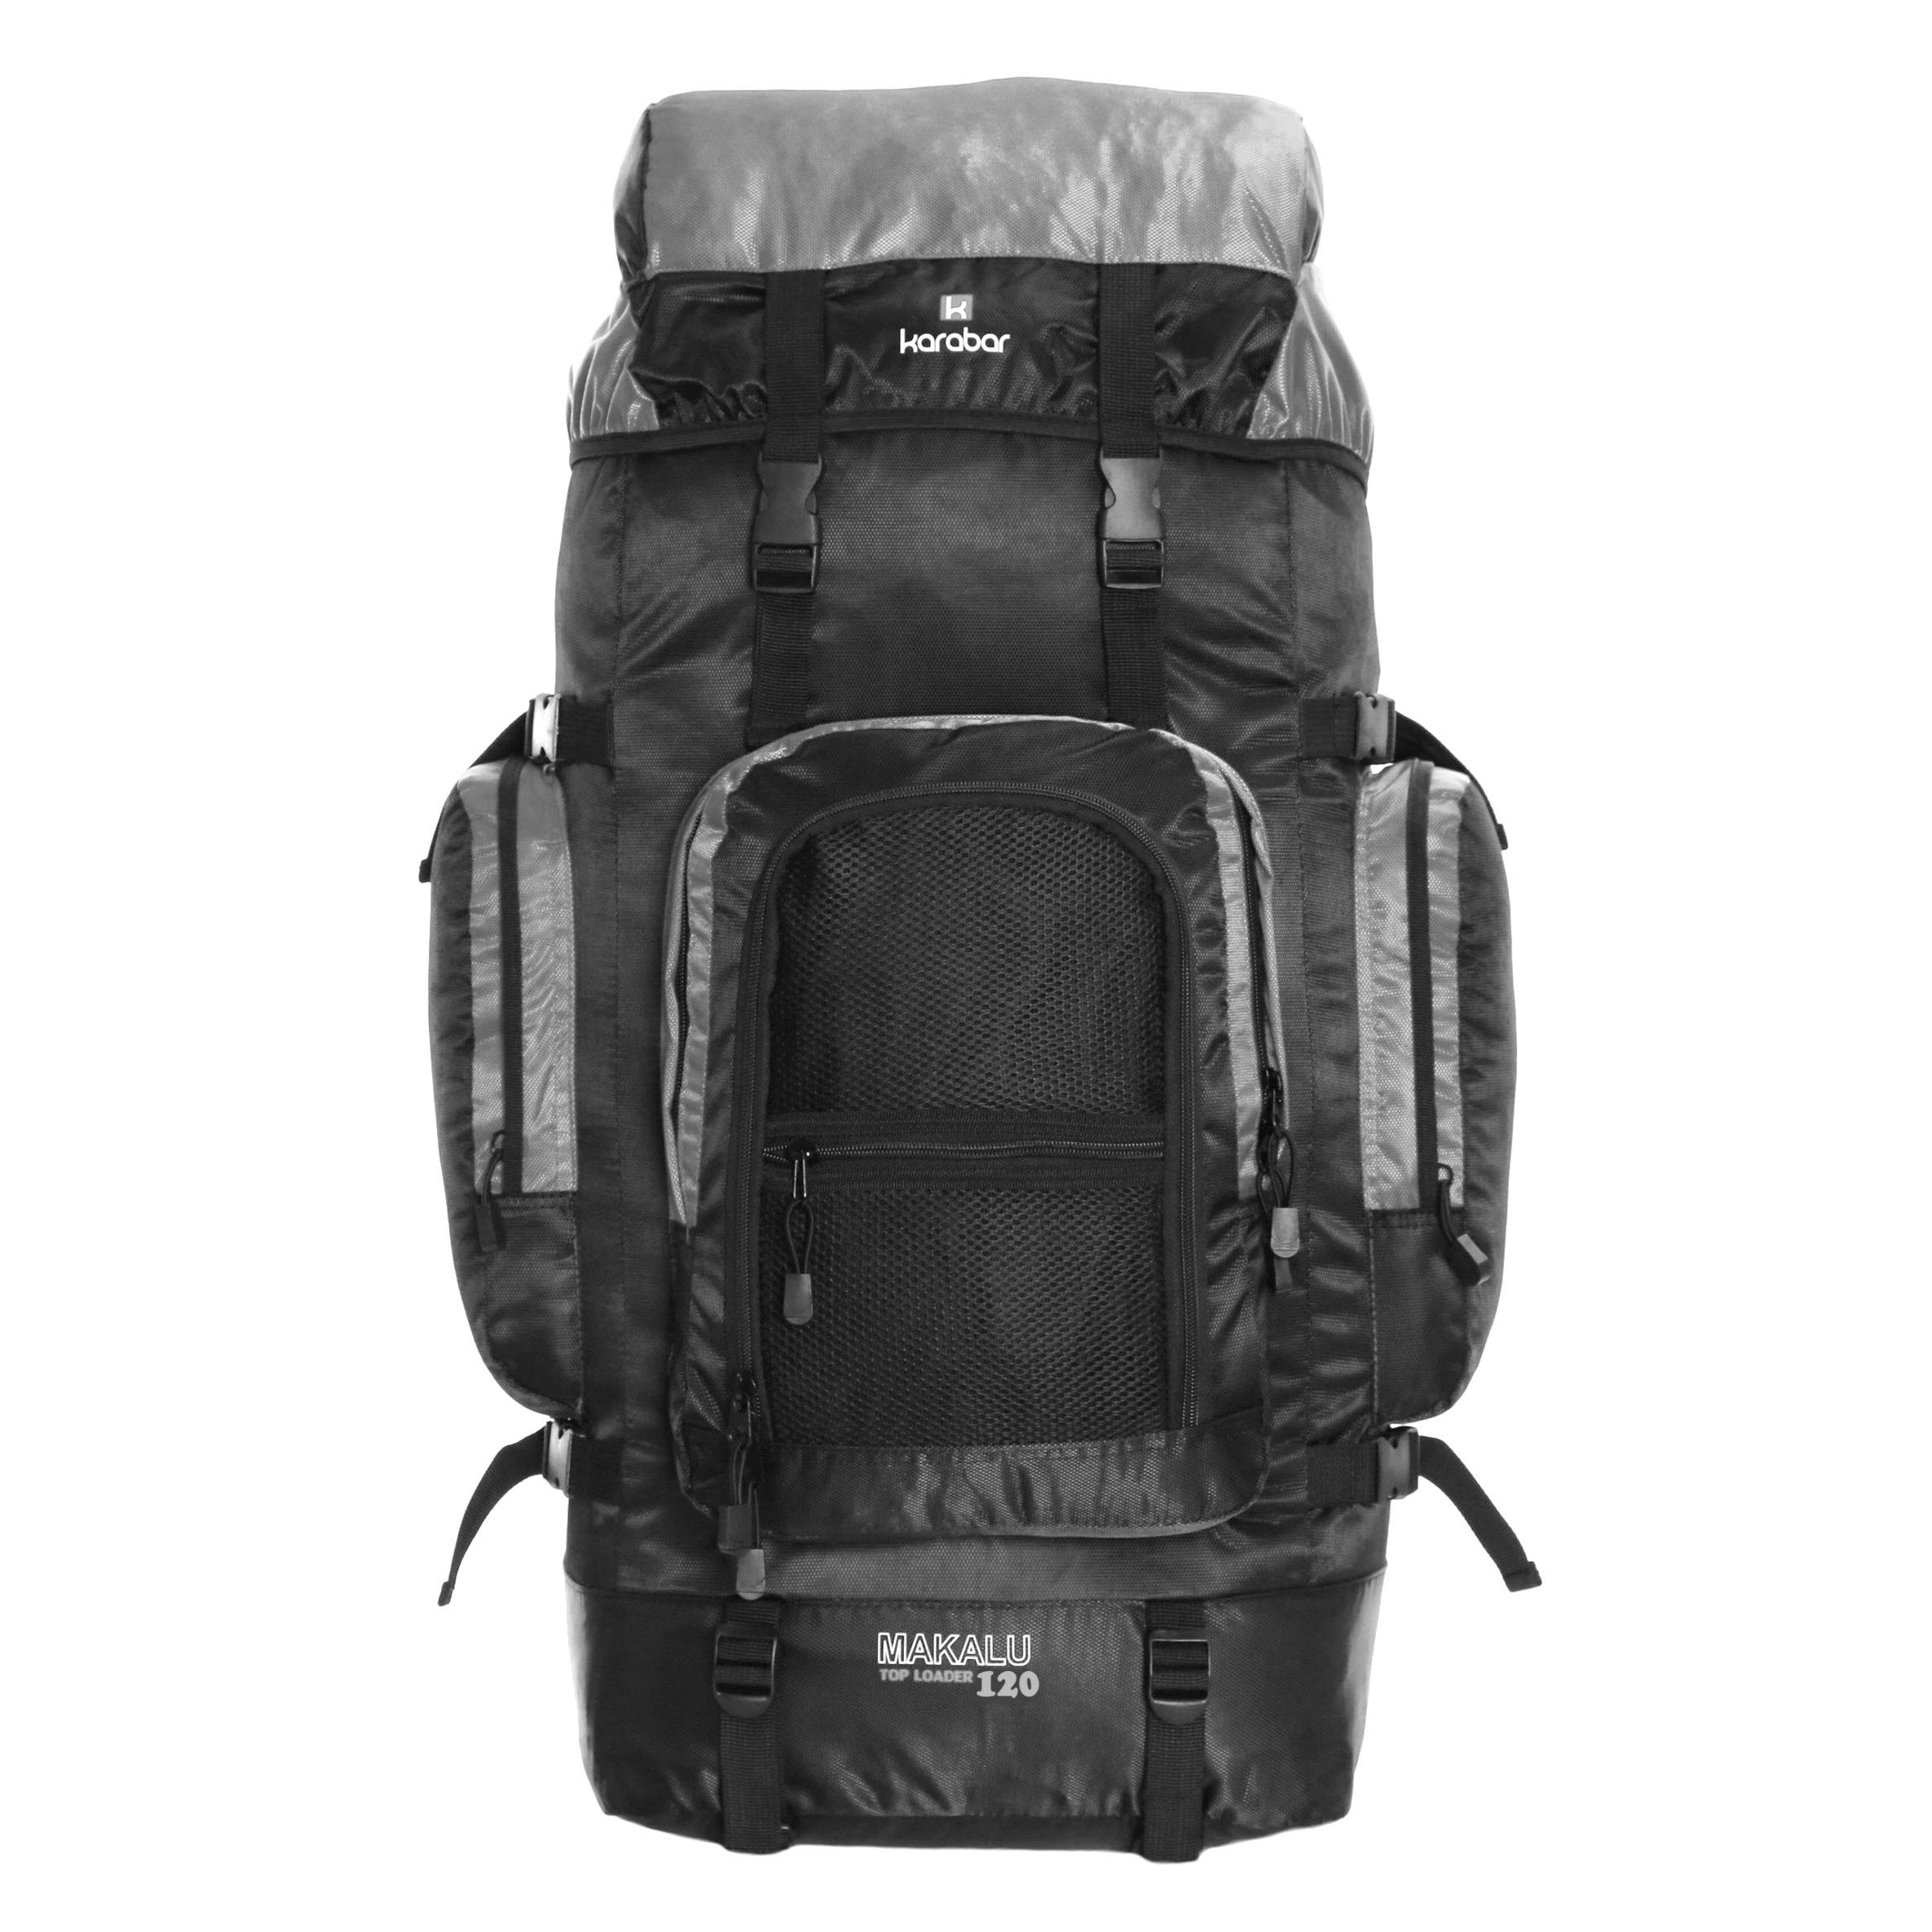 a6cdeb33cded Buy Karabar Makalu 120 Litres Travel Backpack